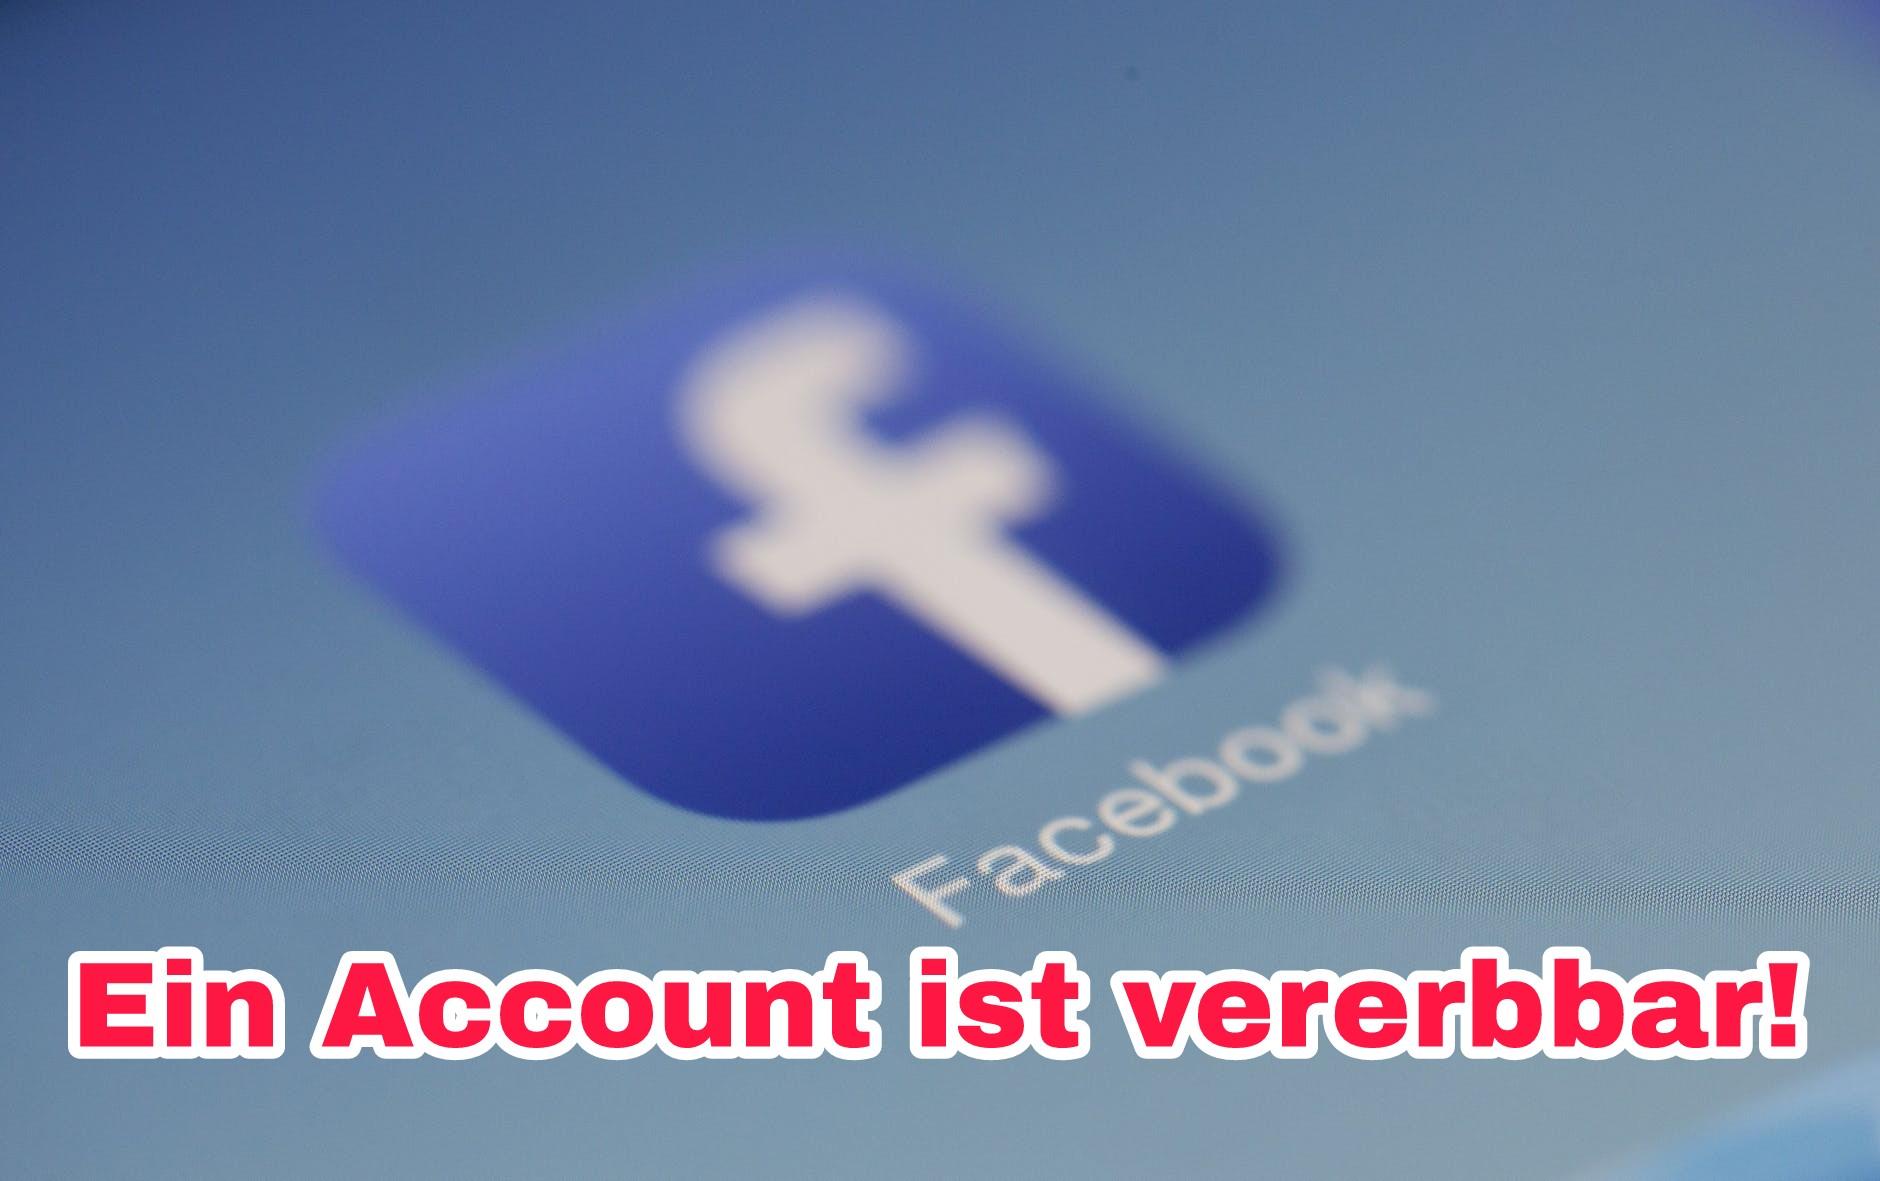 Facebook-Account ist vererbbar!